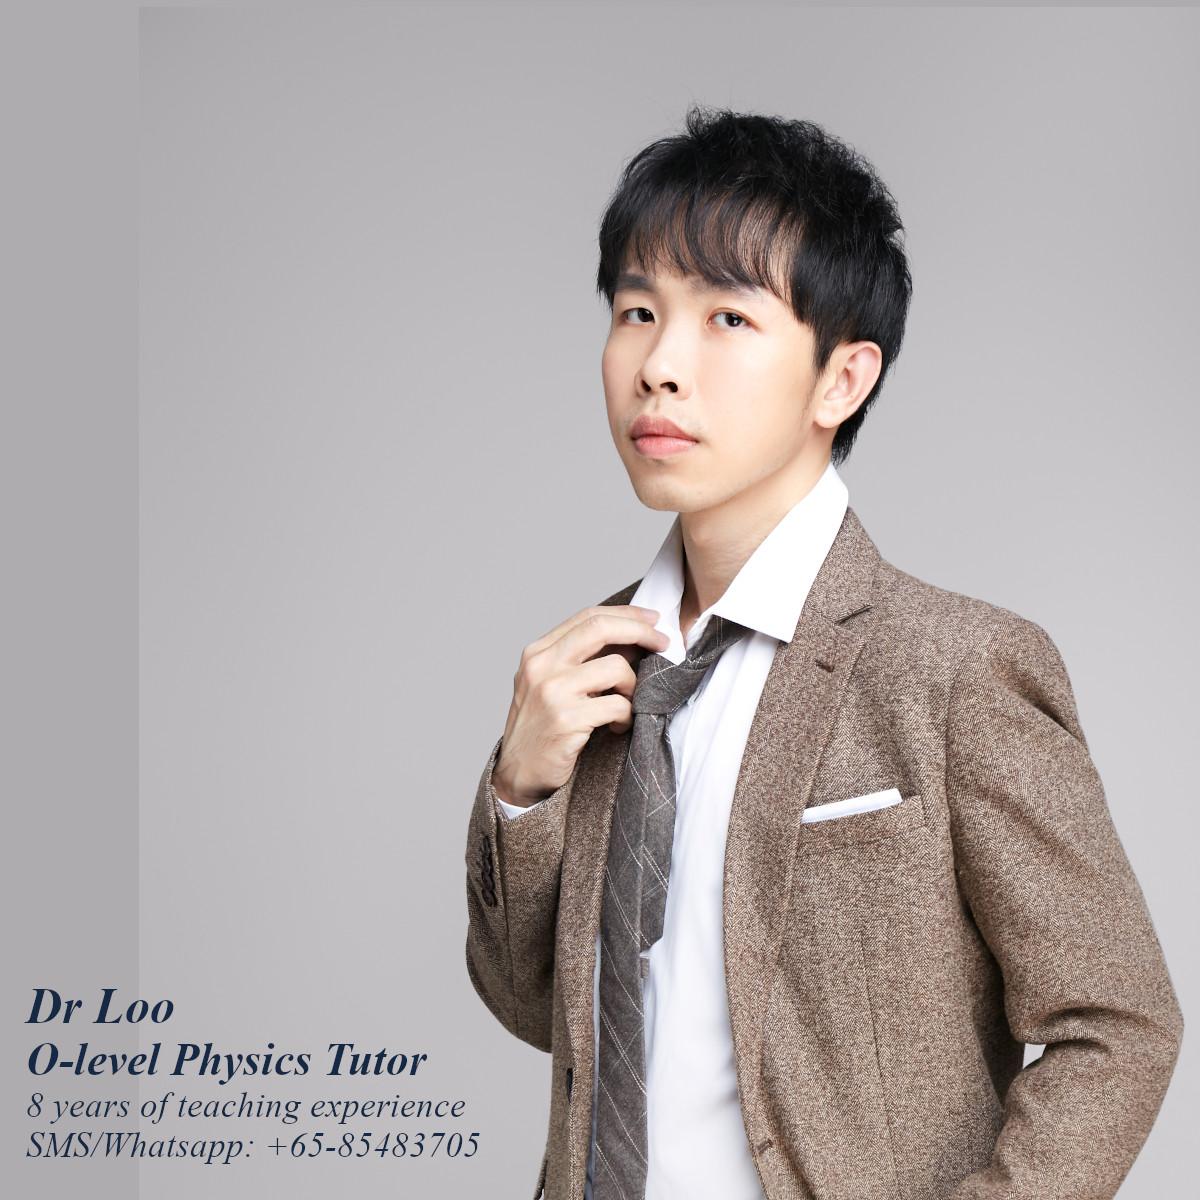 O-level Physics Tutor in Singapore